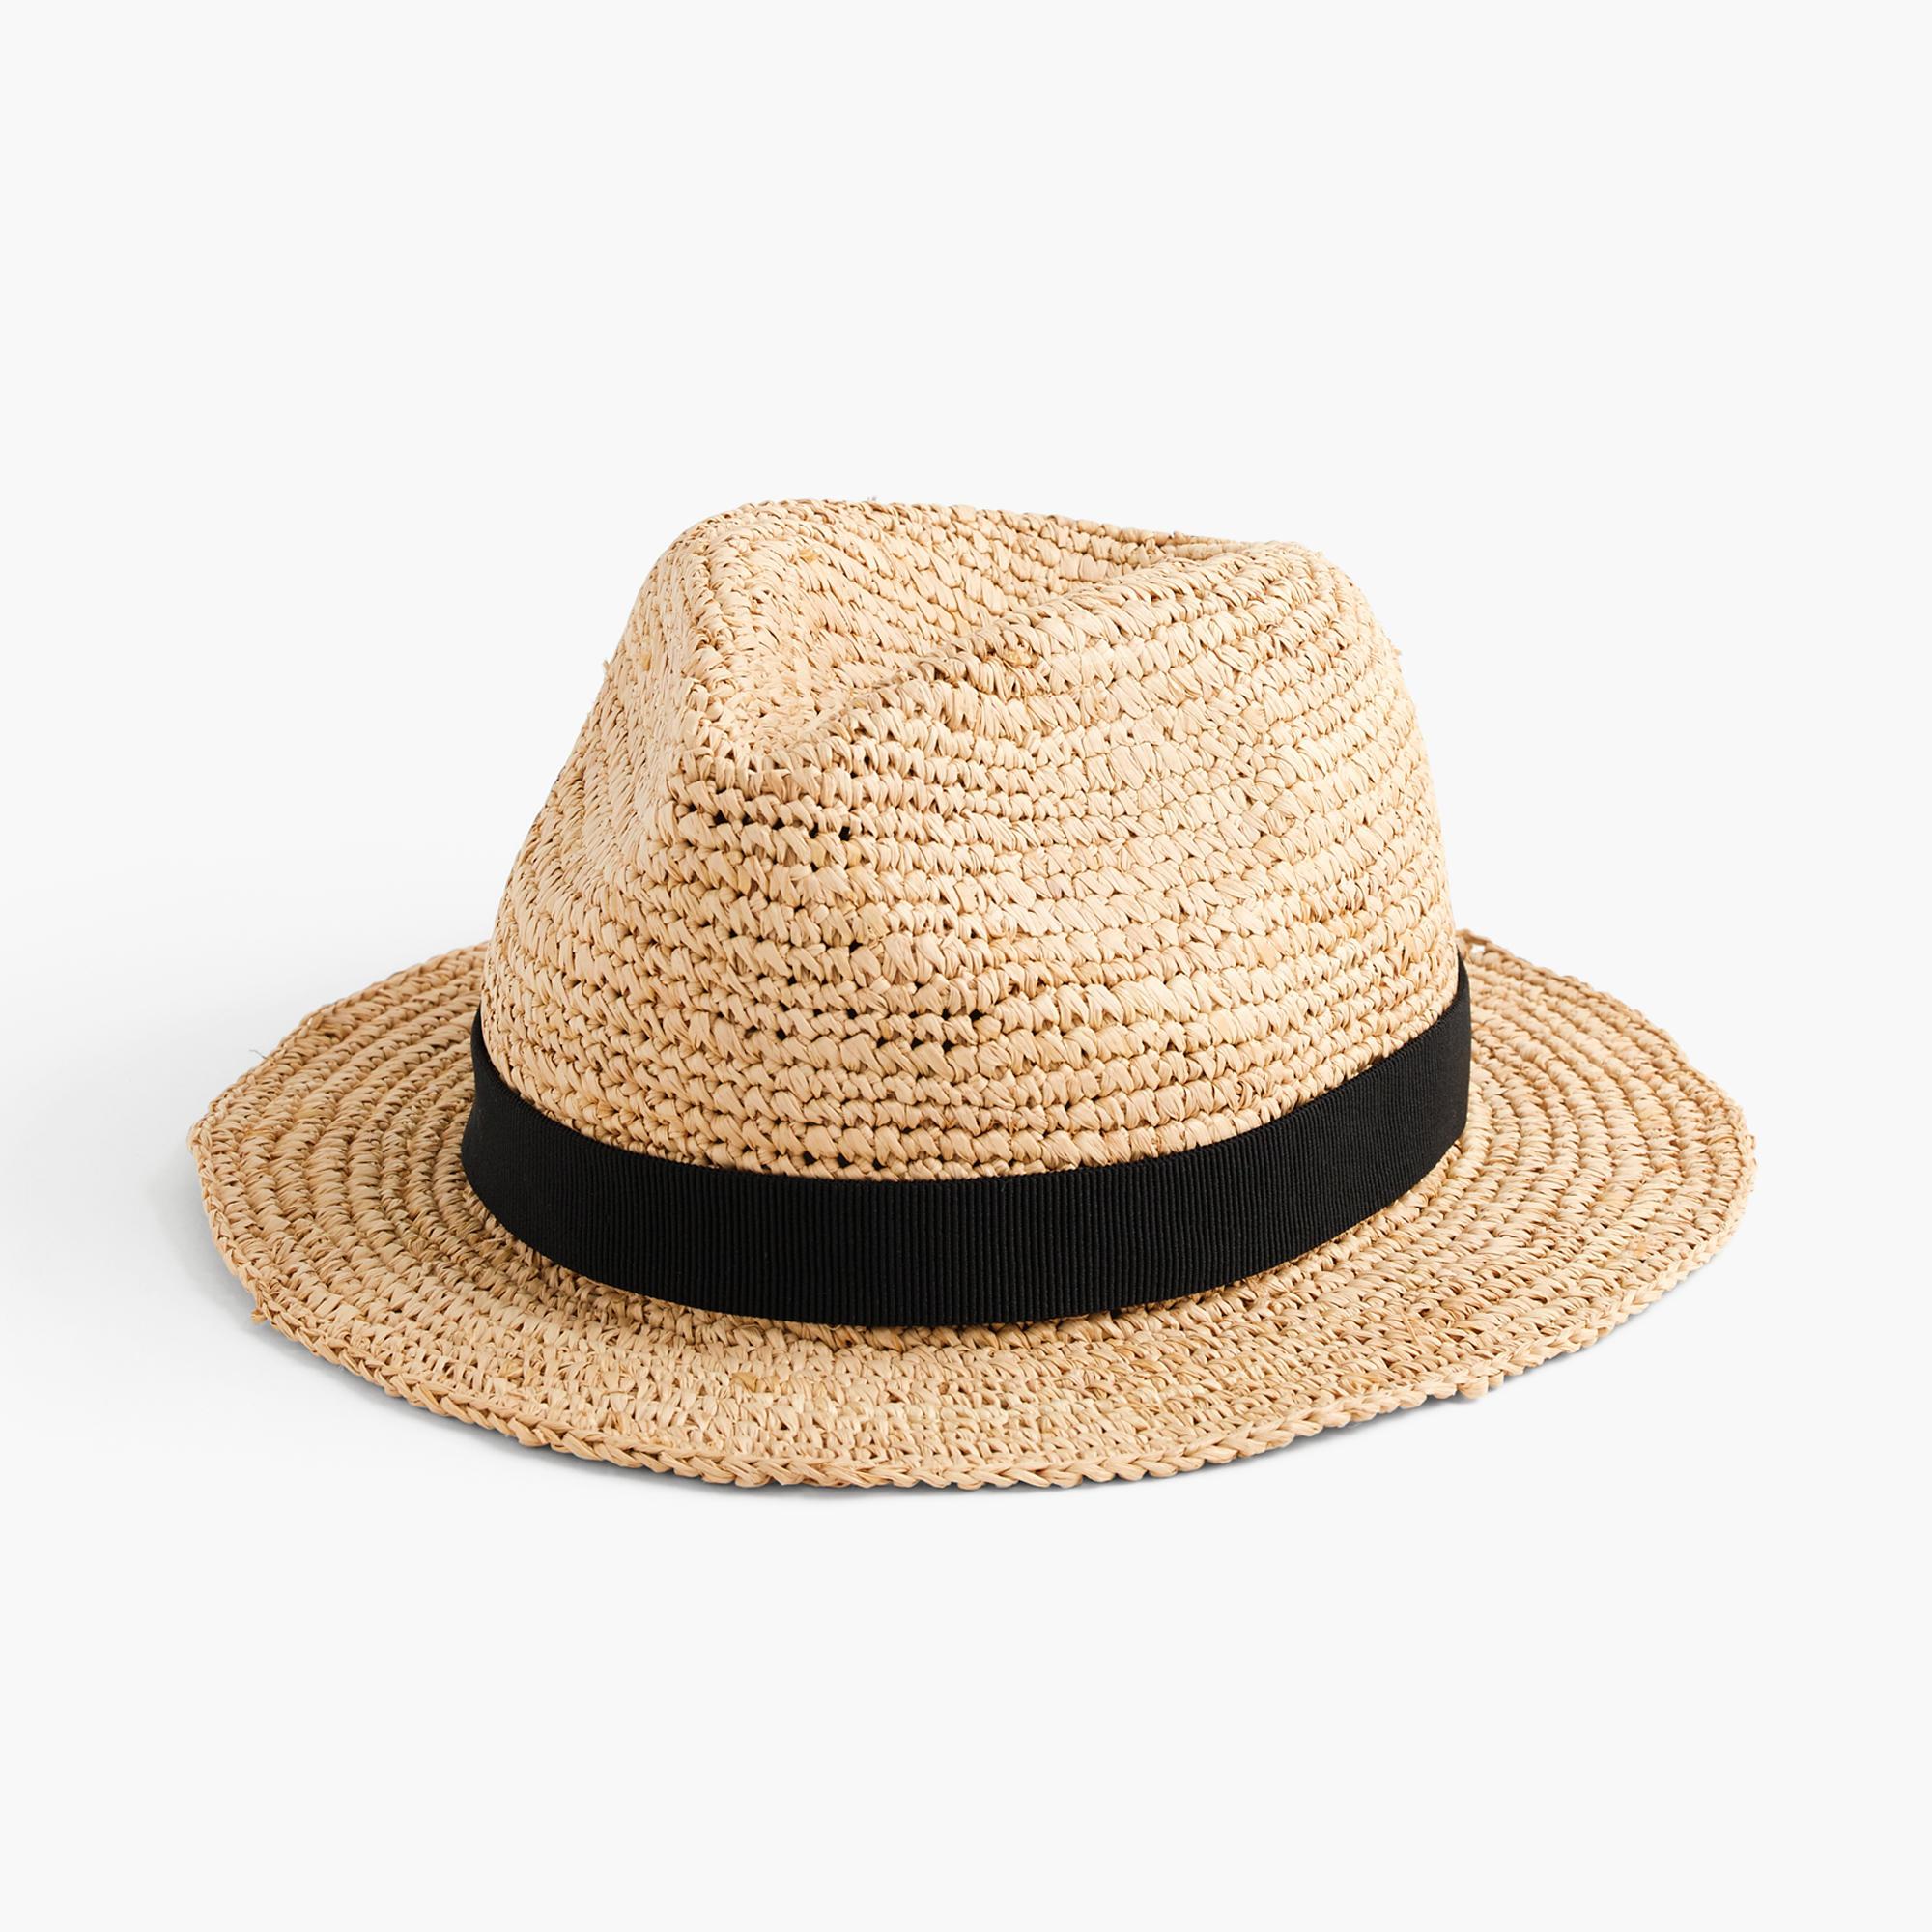 Sundling Studio_6 Summer Updates_Hat.jpeg